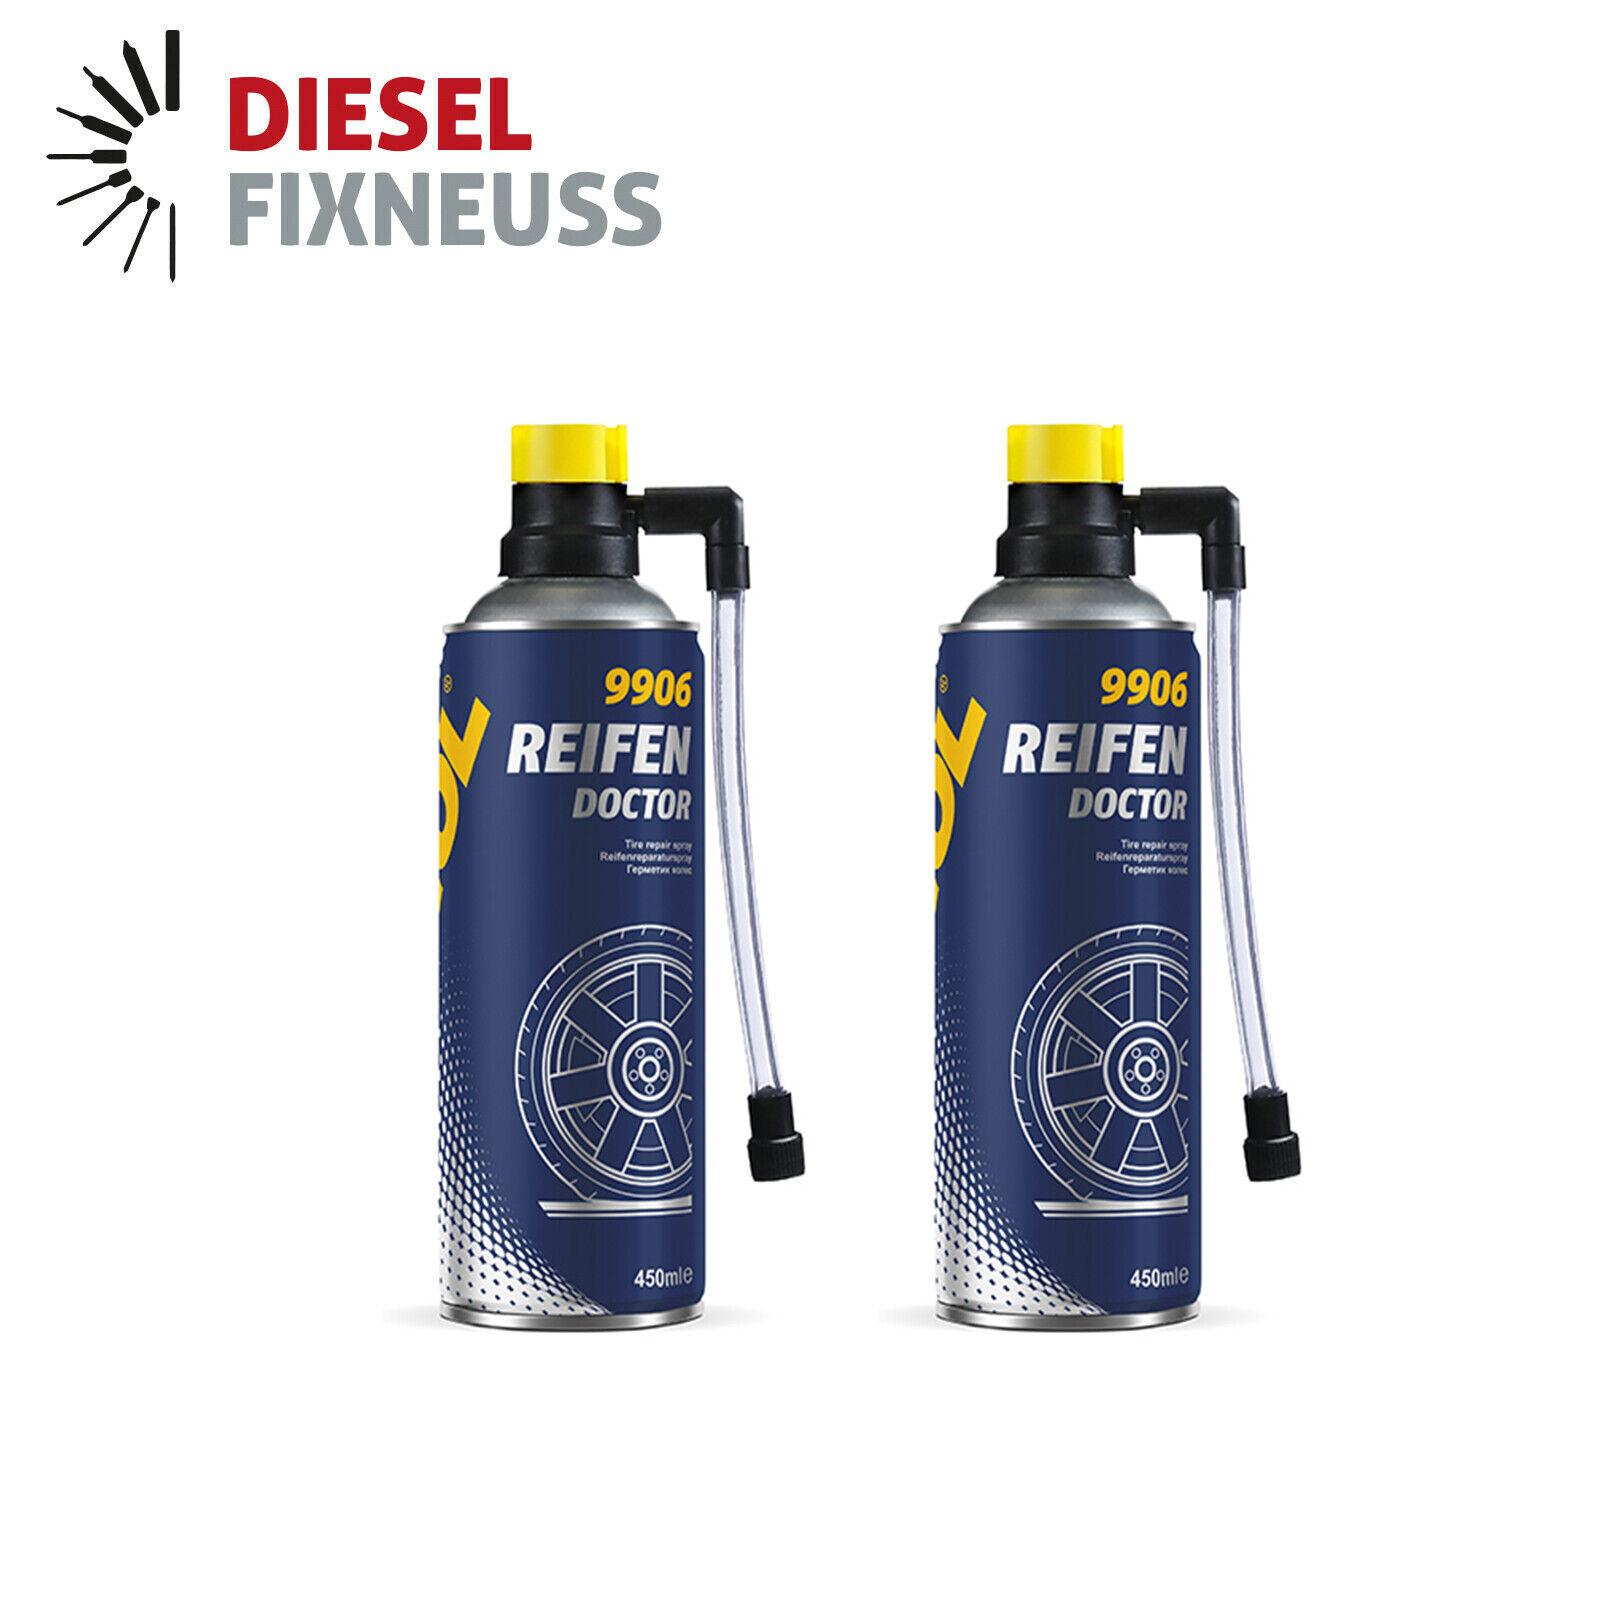 2x 450ml MANNOL Reifendoktor Reifendicht Pannenhilfe Reifenpilot Reifen Doctor